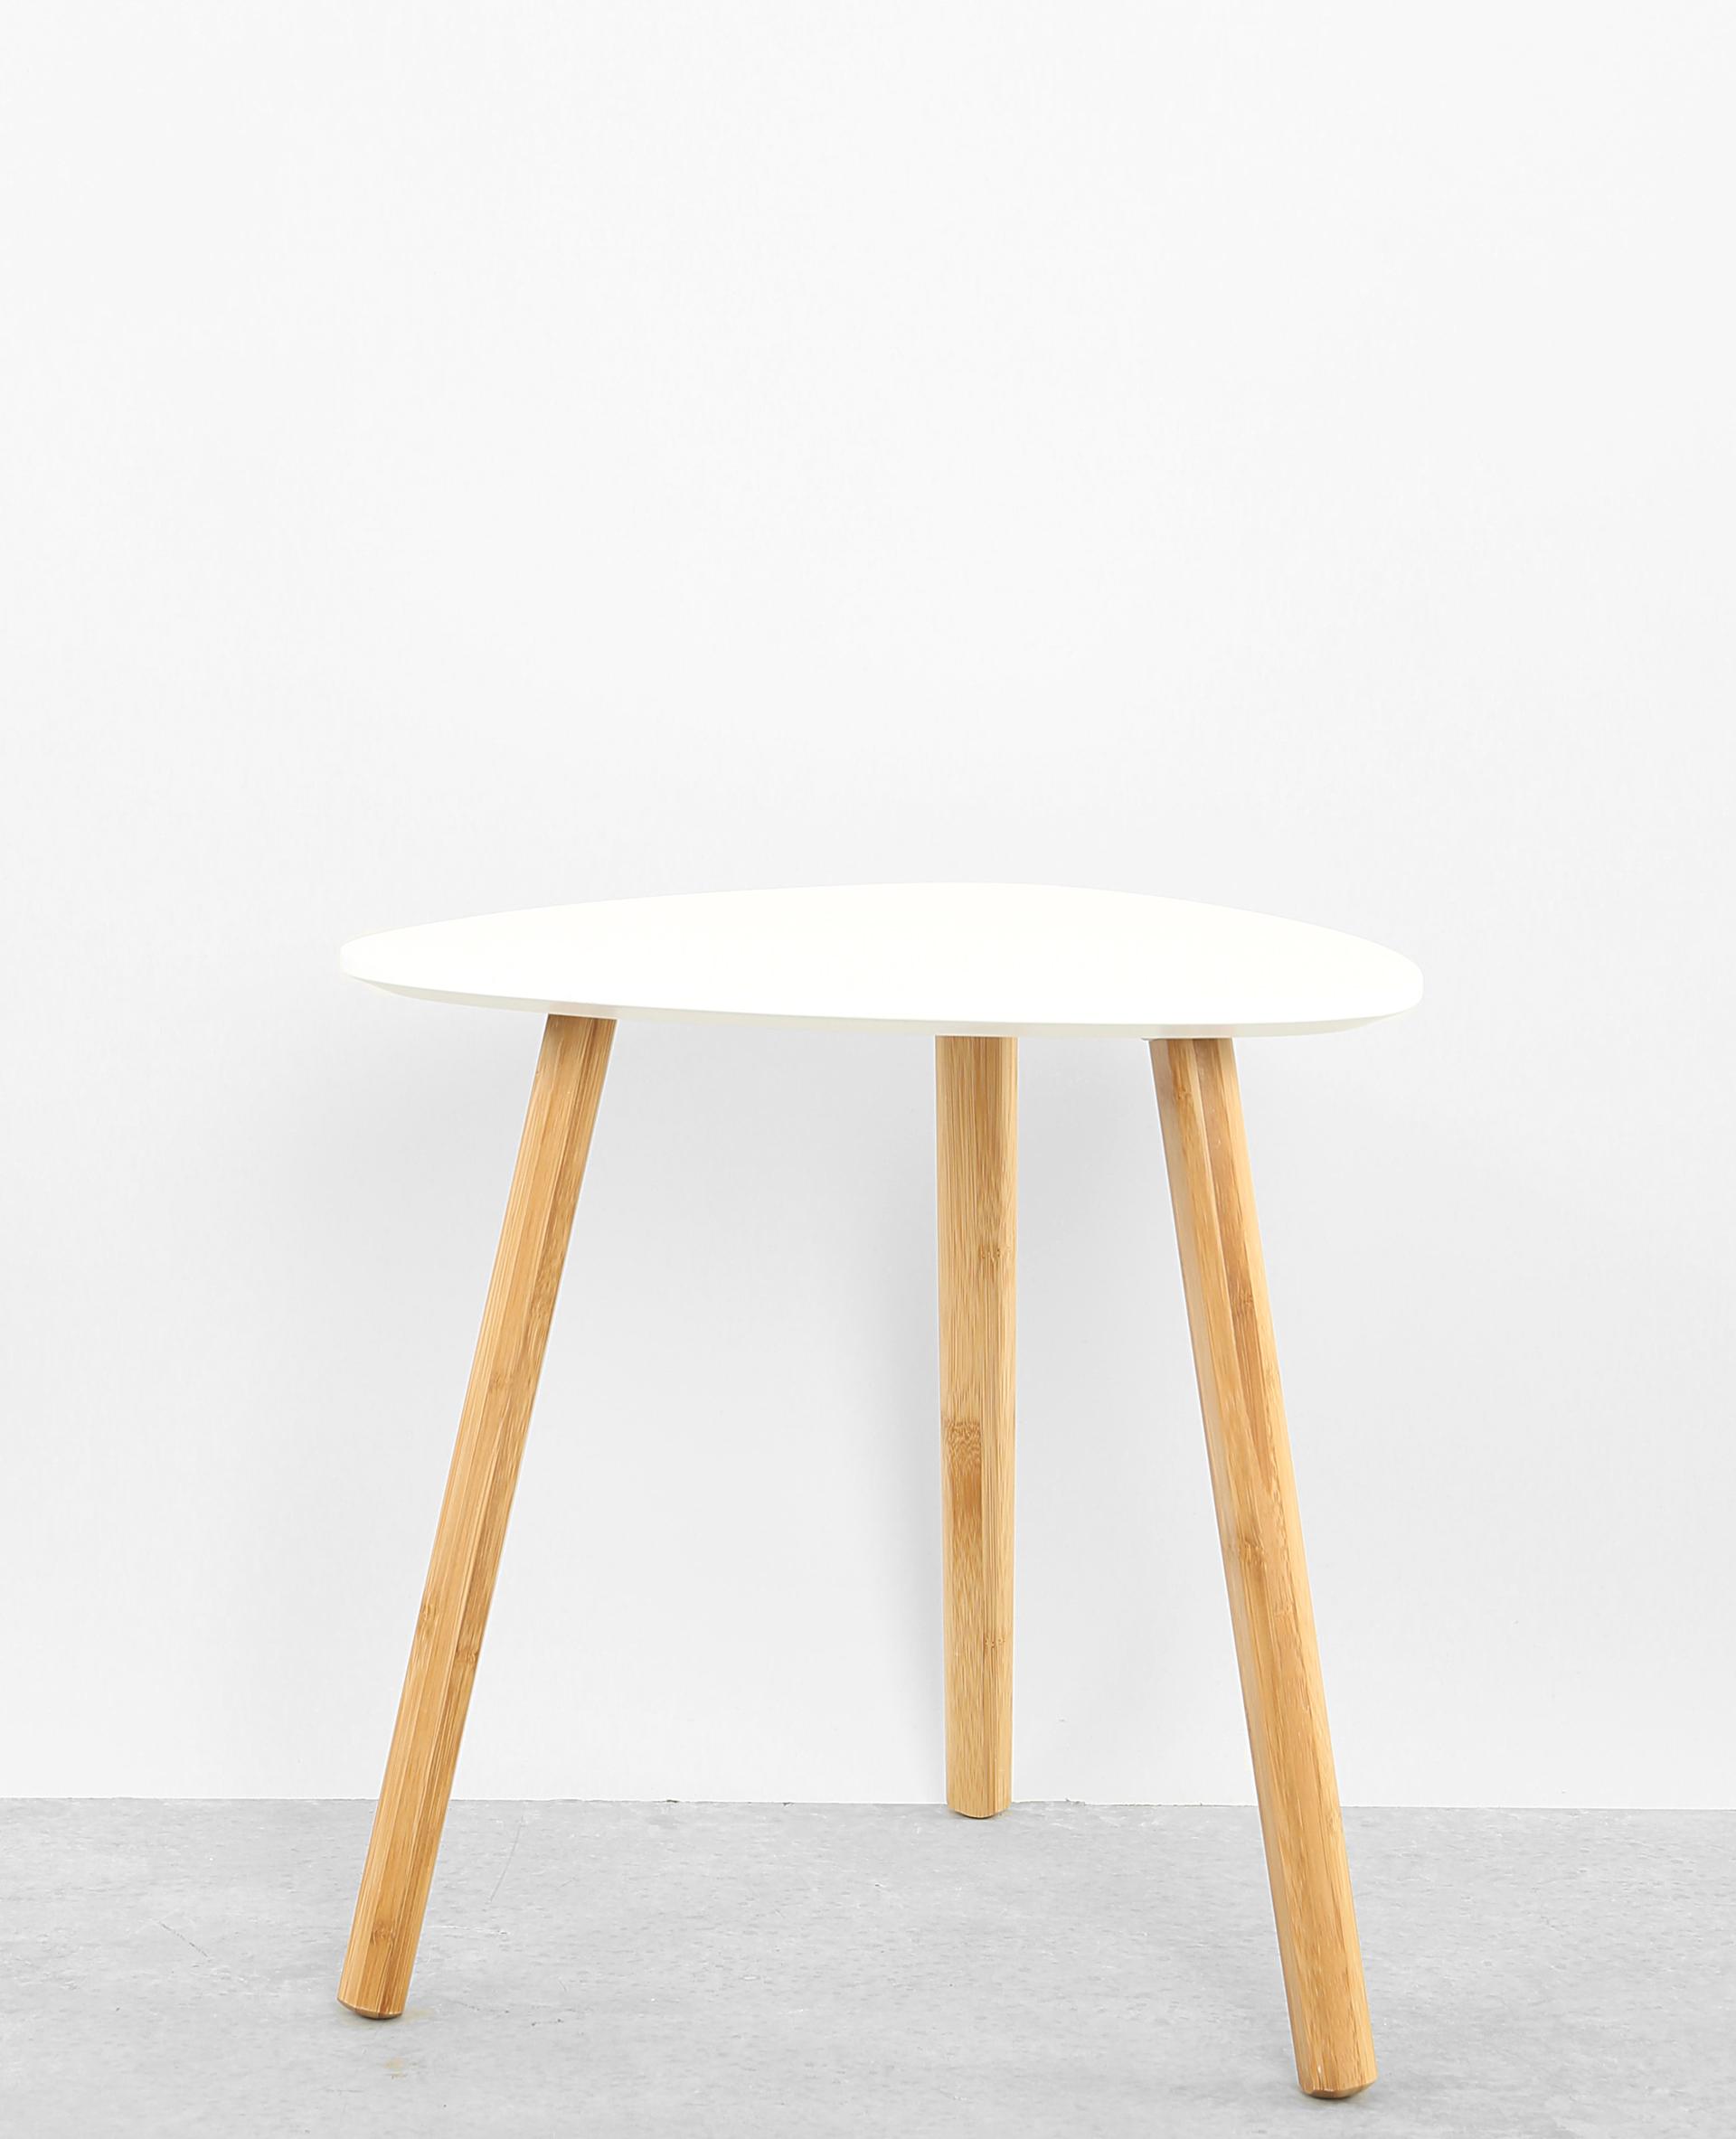 petite table 3 pieds blanc cass 904034912a09 pimkie. Black Bedroom Furniture Sets. Home Design Ideas